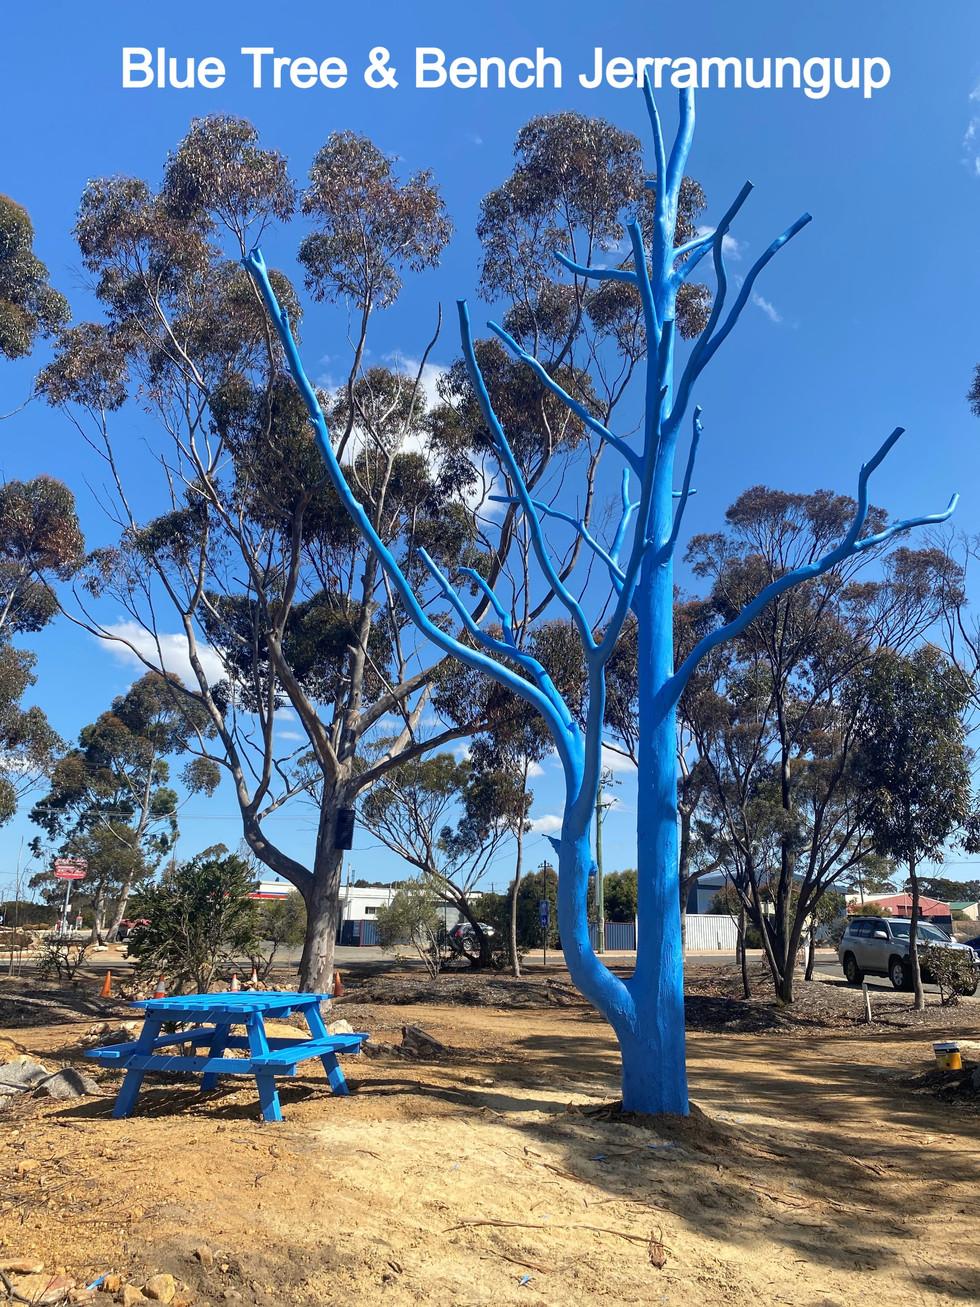 jerramungup Blue Tree and Bench